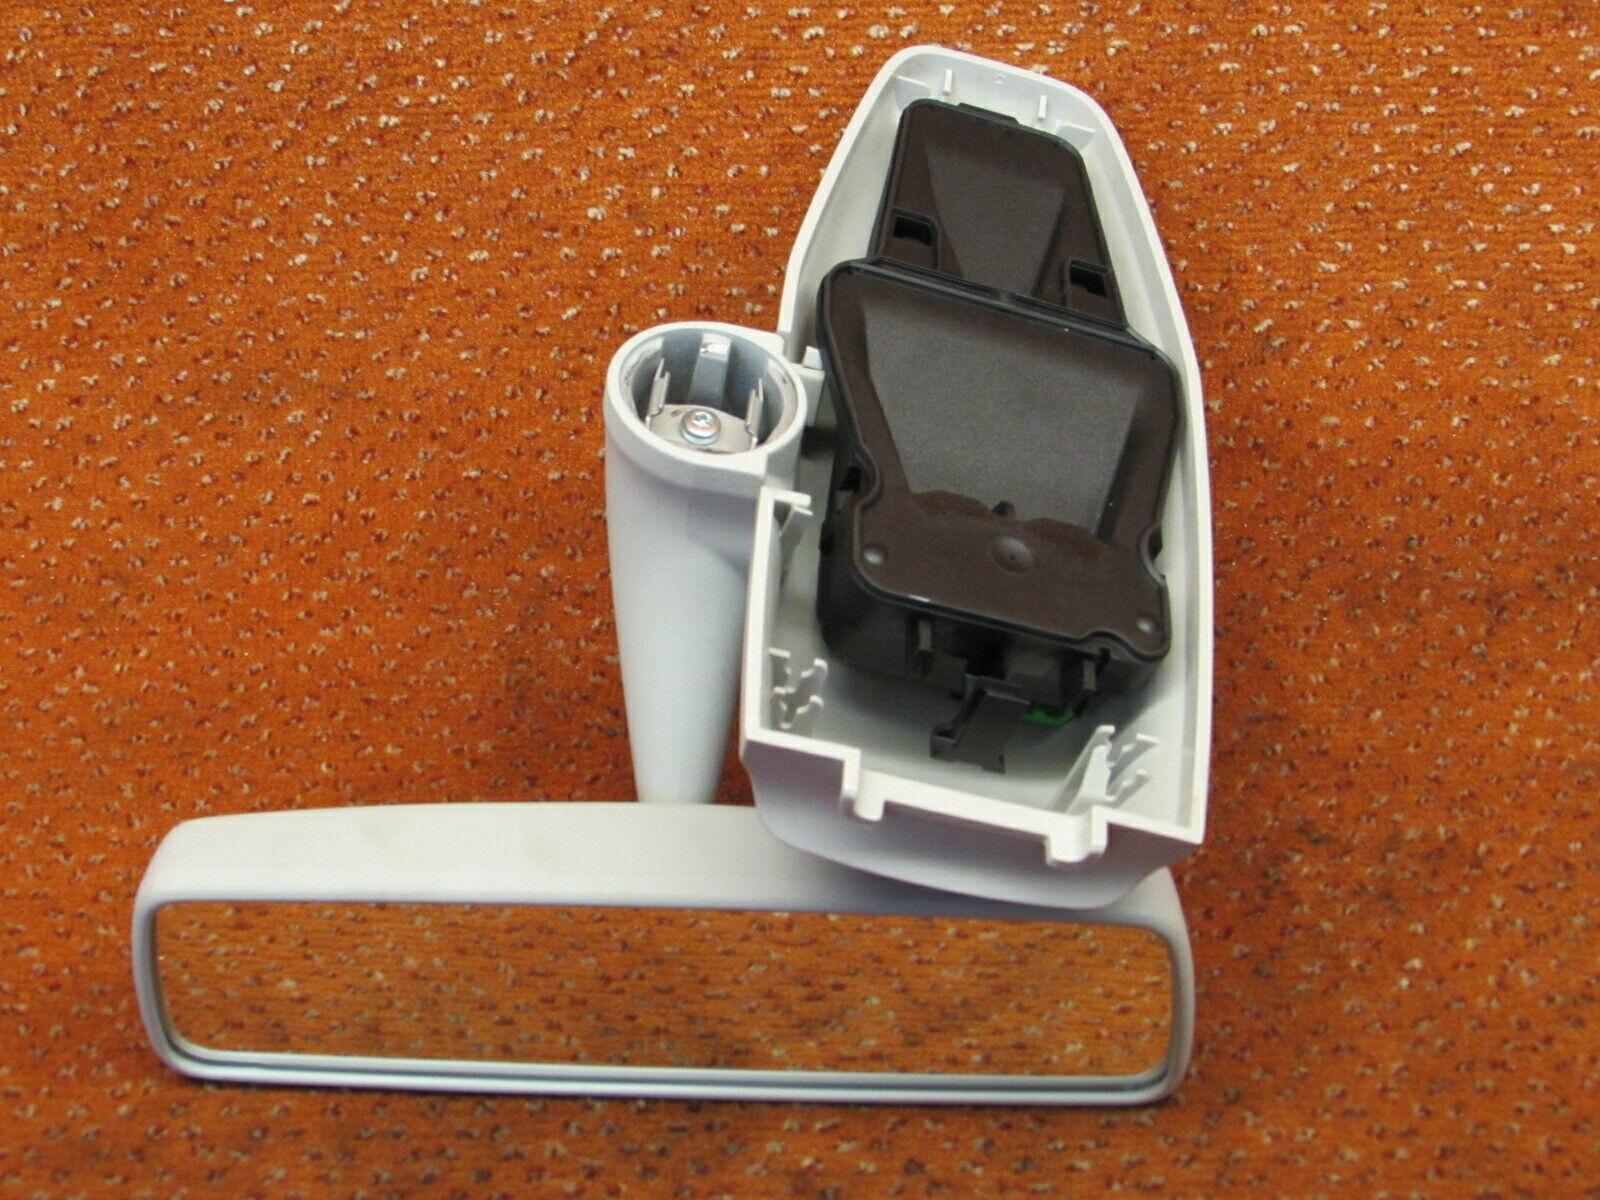 s l1600 - 1S0907201 Sensoreinheit Espejo Interior Detector City Notbremsfunktion VW Up!